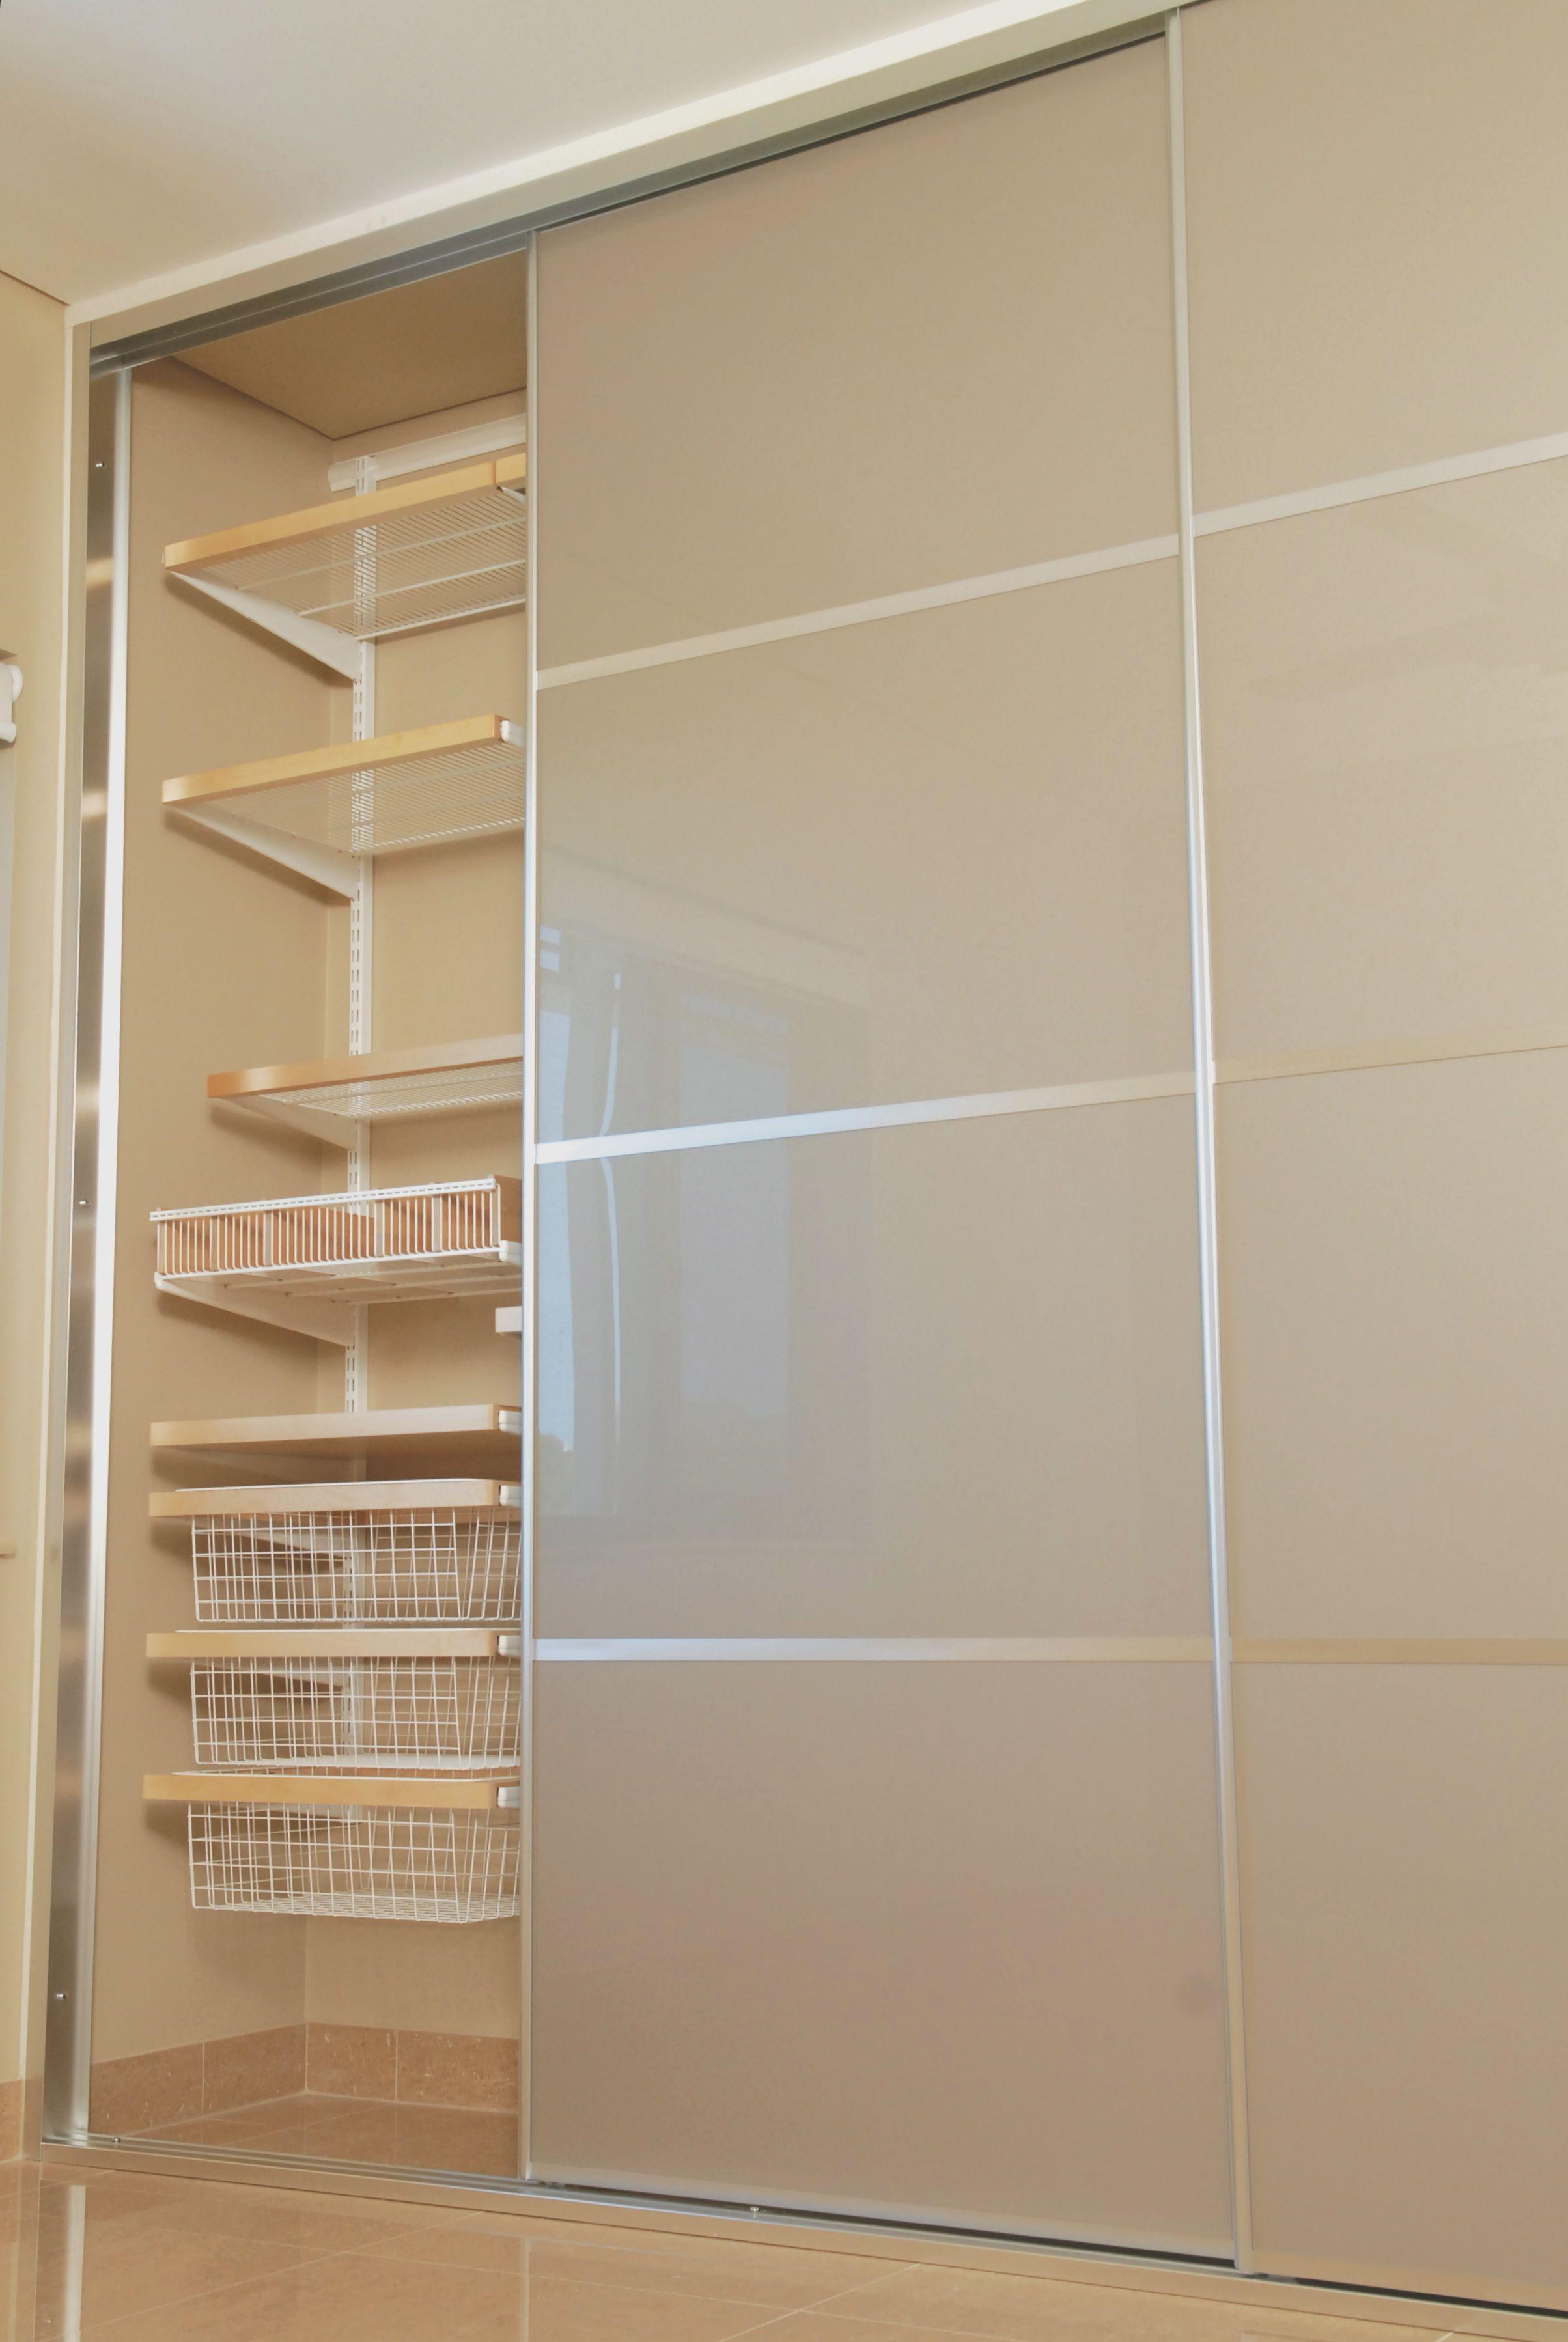 Wardrobe sliding 4 panel doors panels are stylite for 4 door wardrobe interior designs